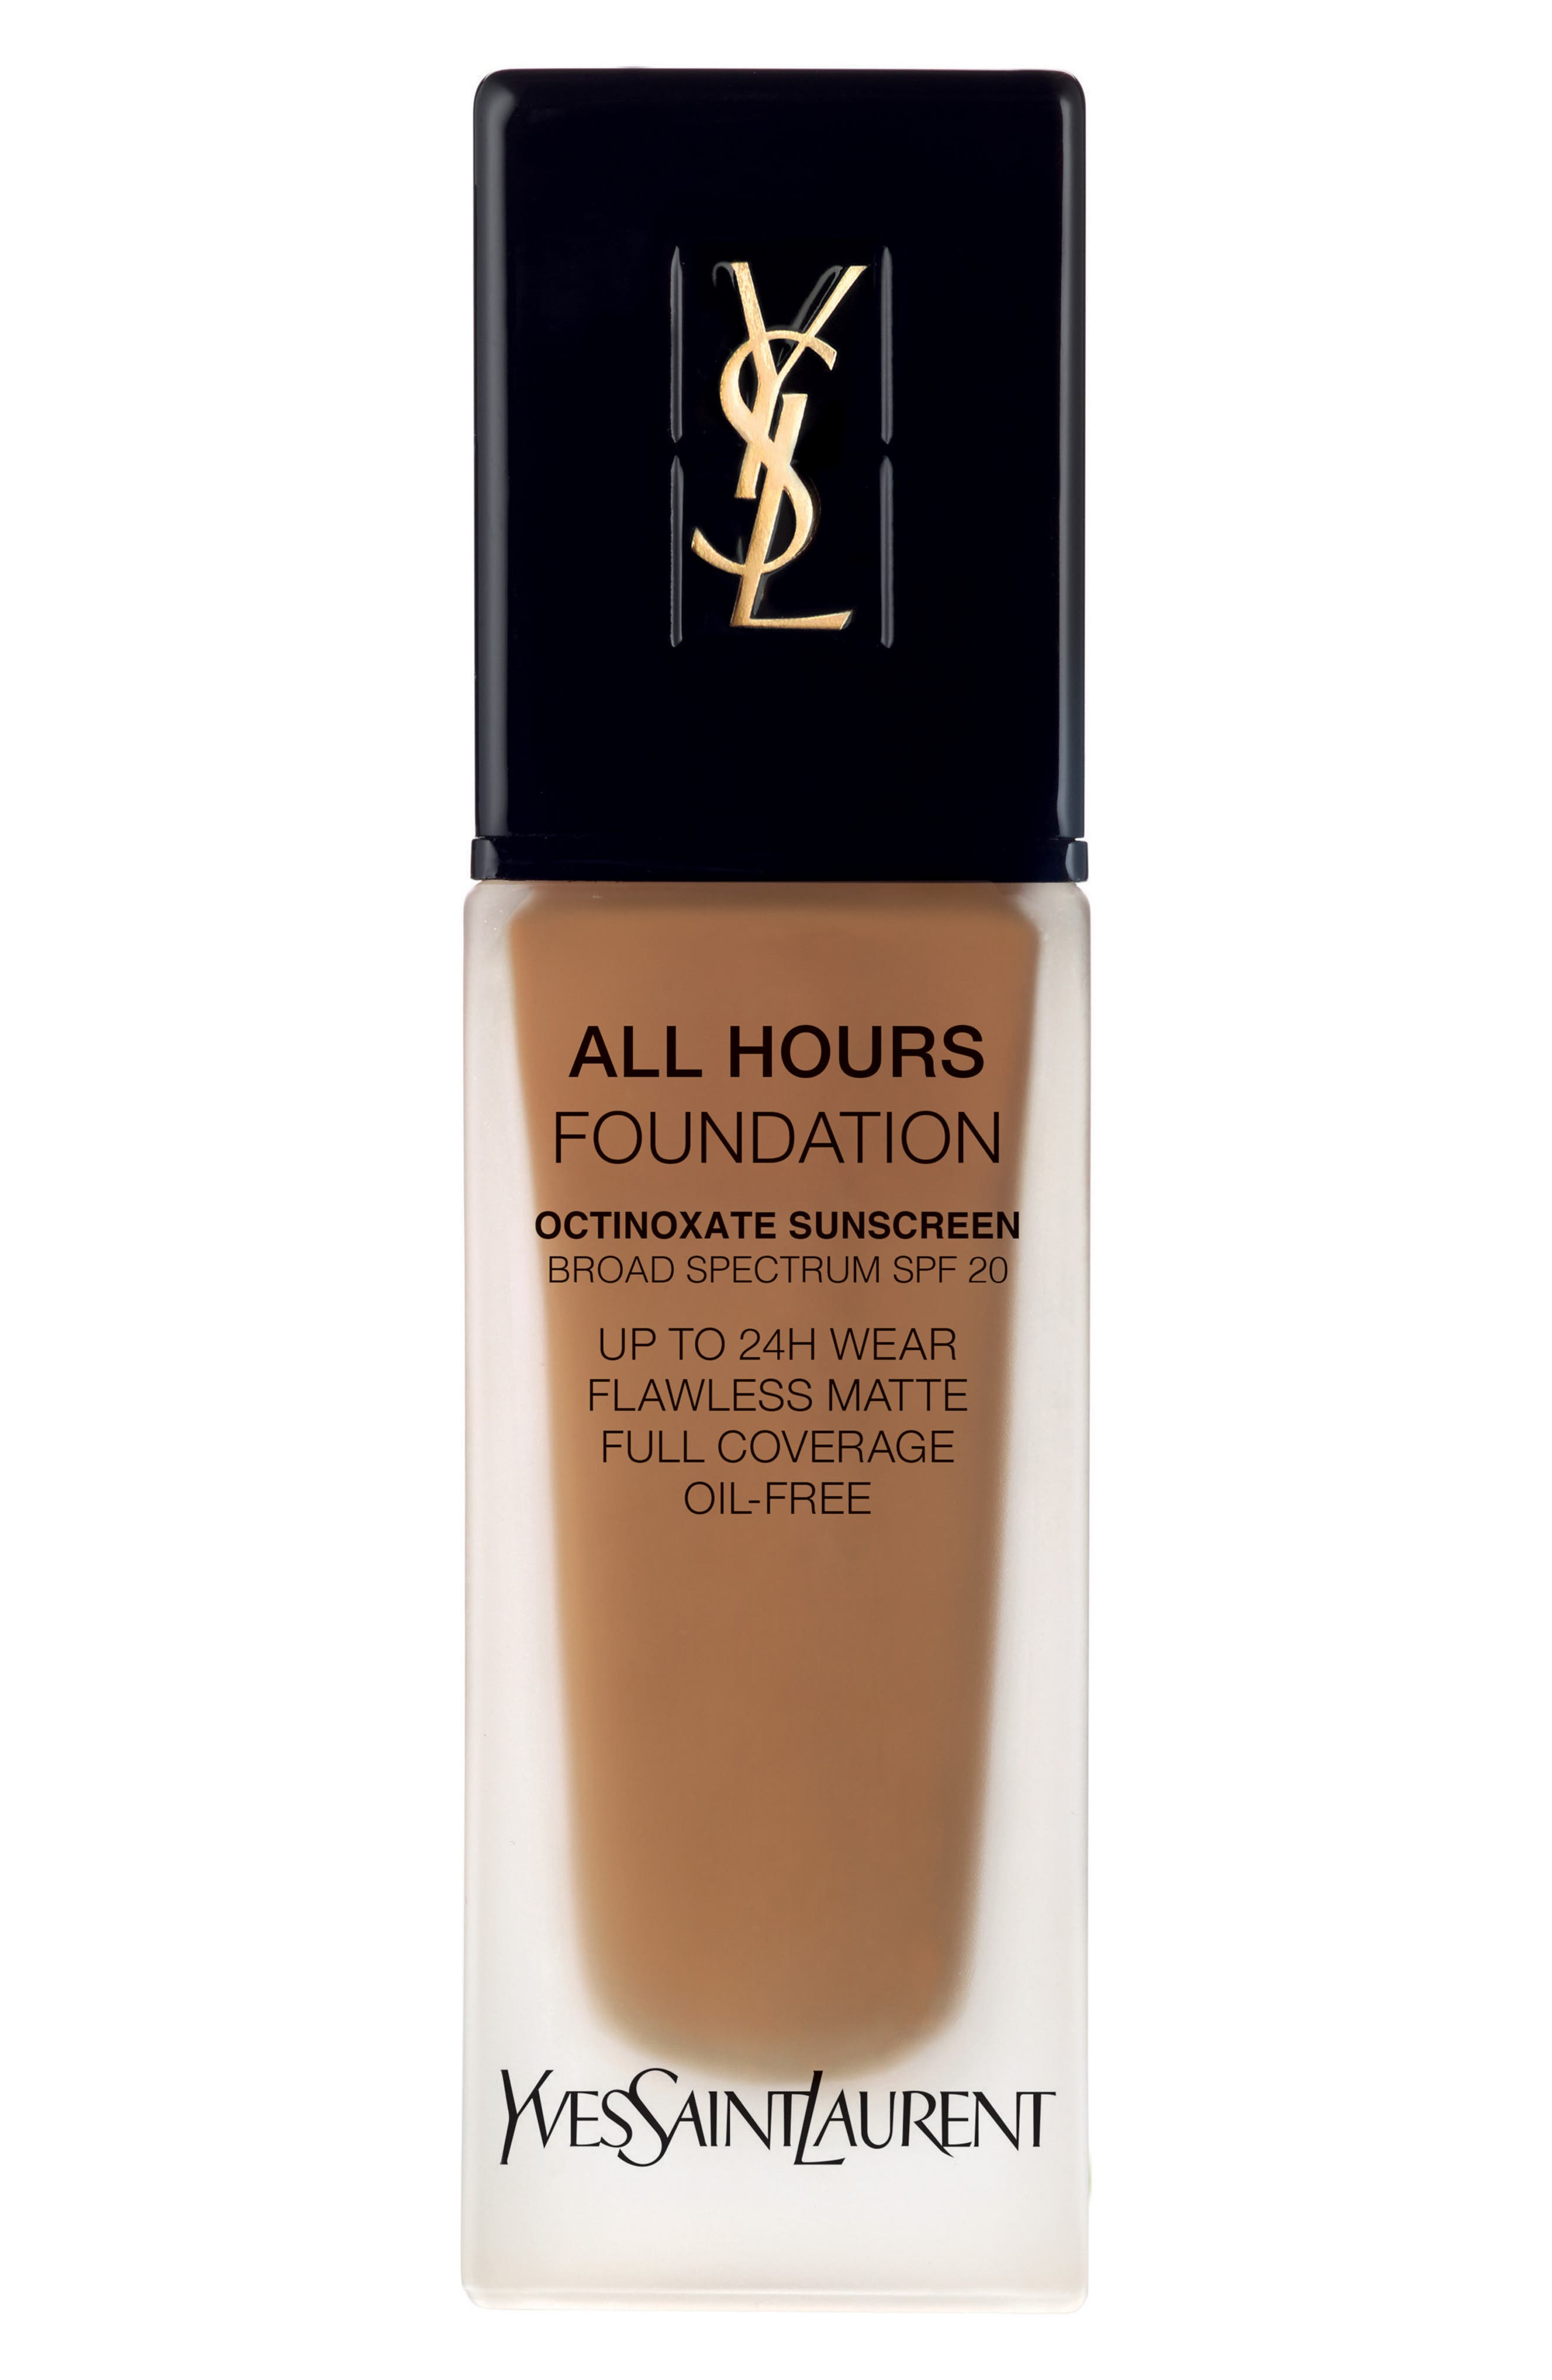 Yves Saint Laurent All Hours Full Coverage Matte Foundation Spf 20 - B80 Chocolate